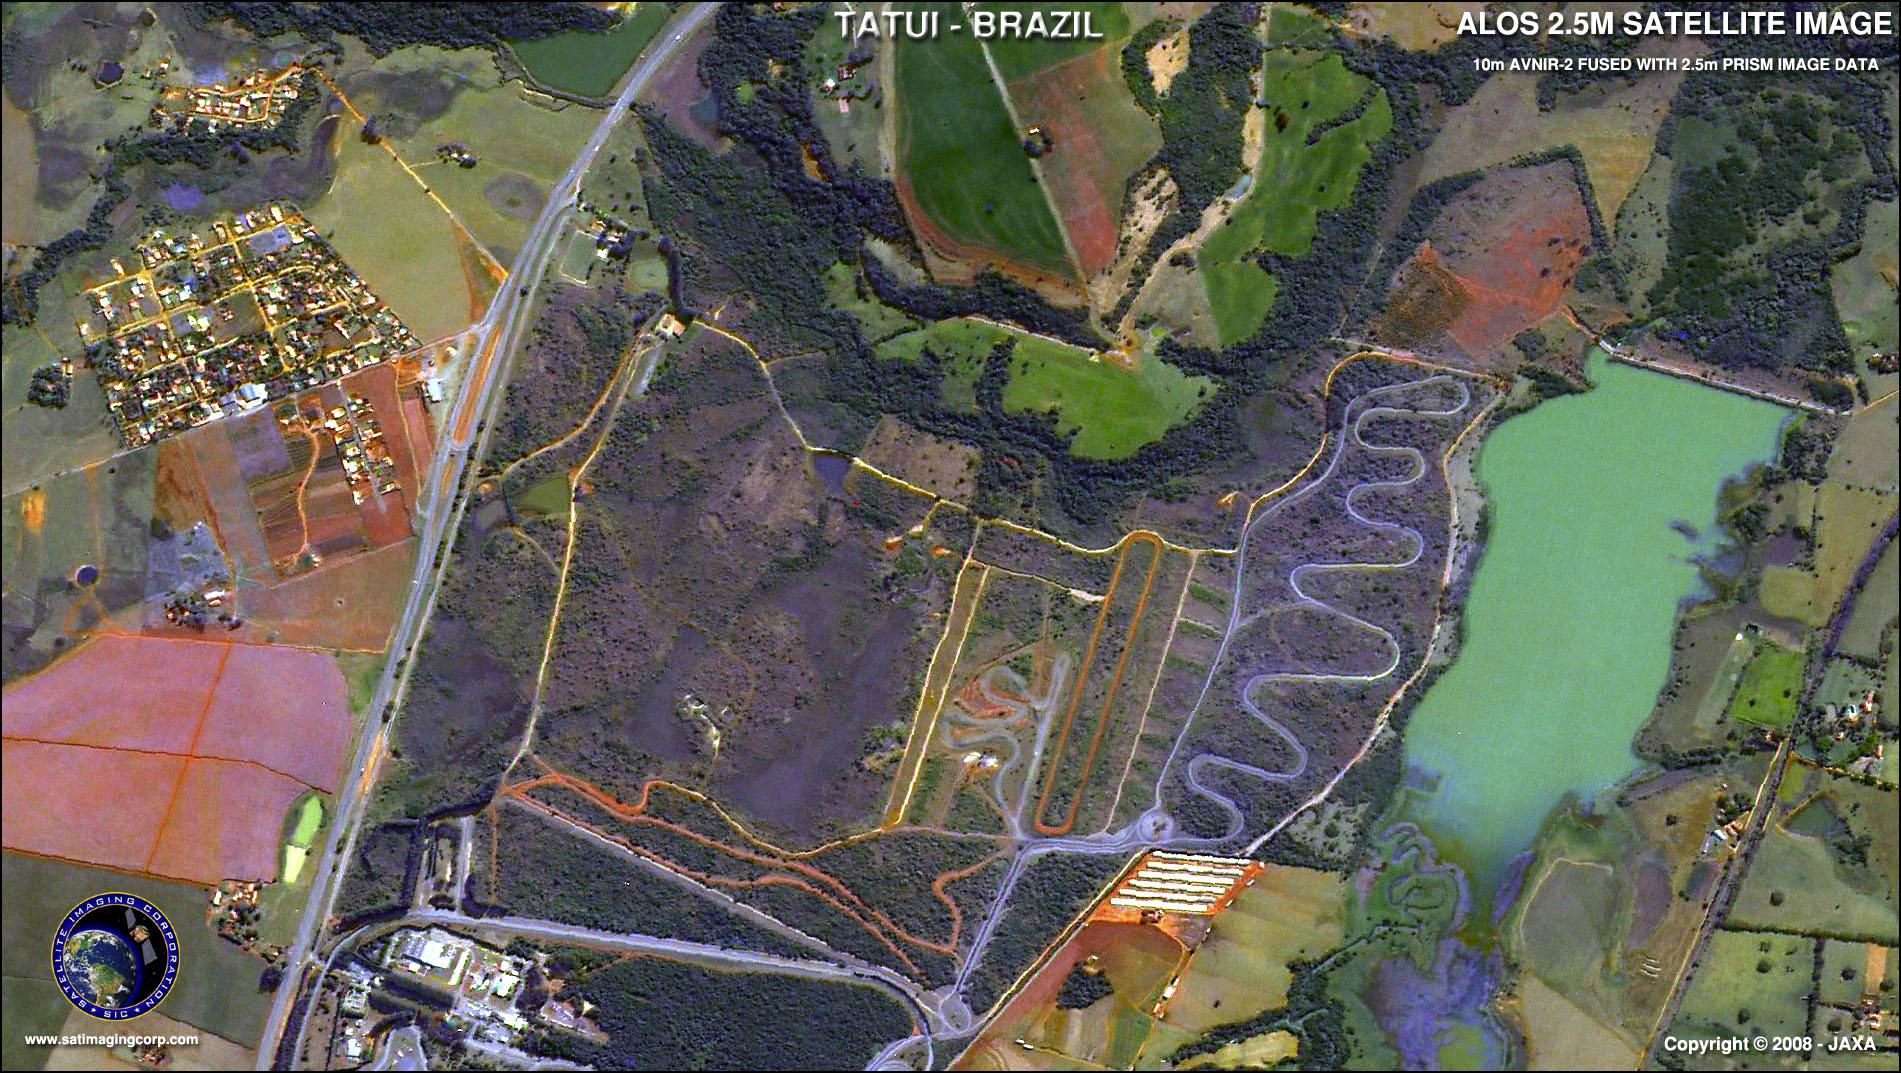 ALOS Satellite Image of Tatui   Satellite Imaging Corp